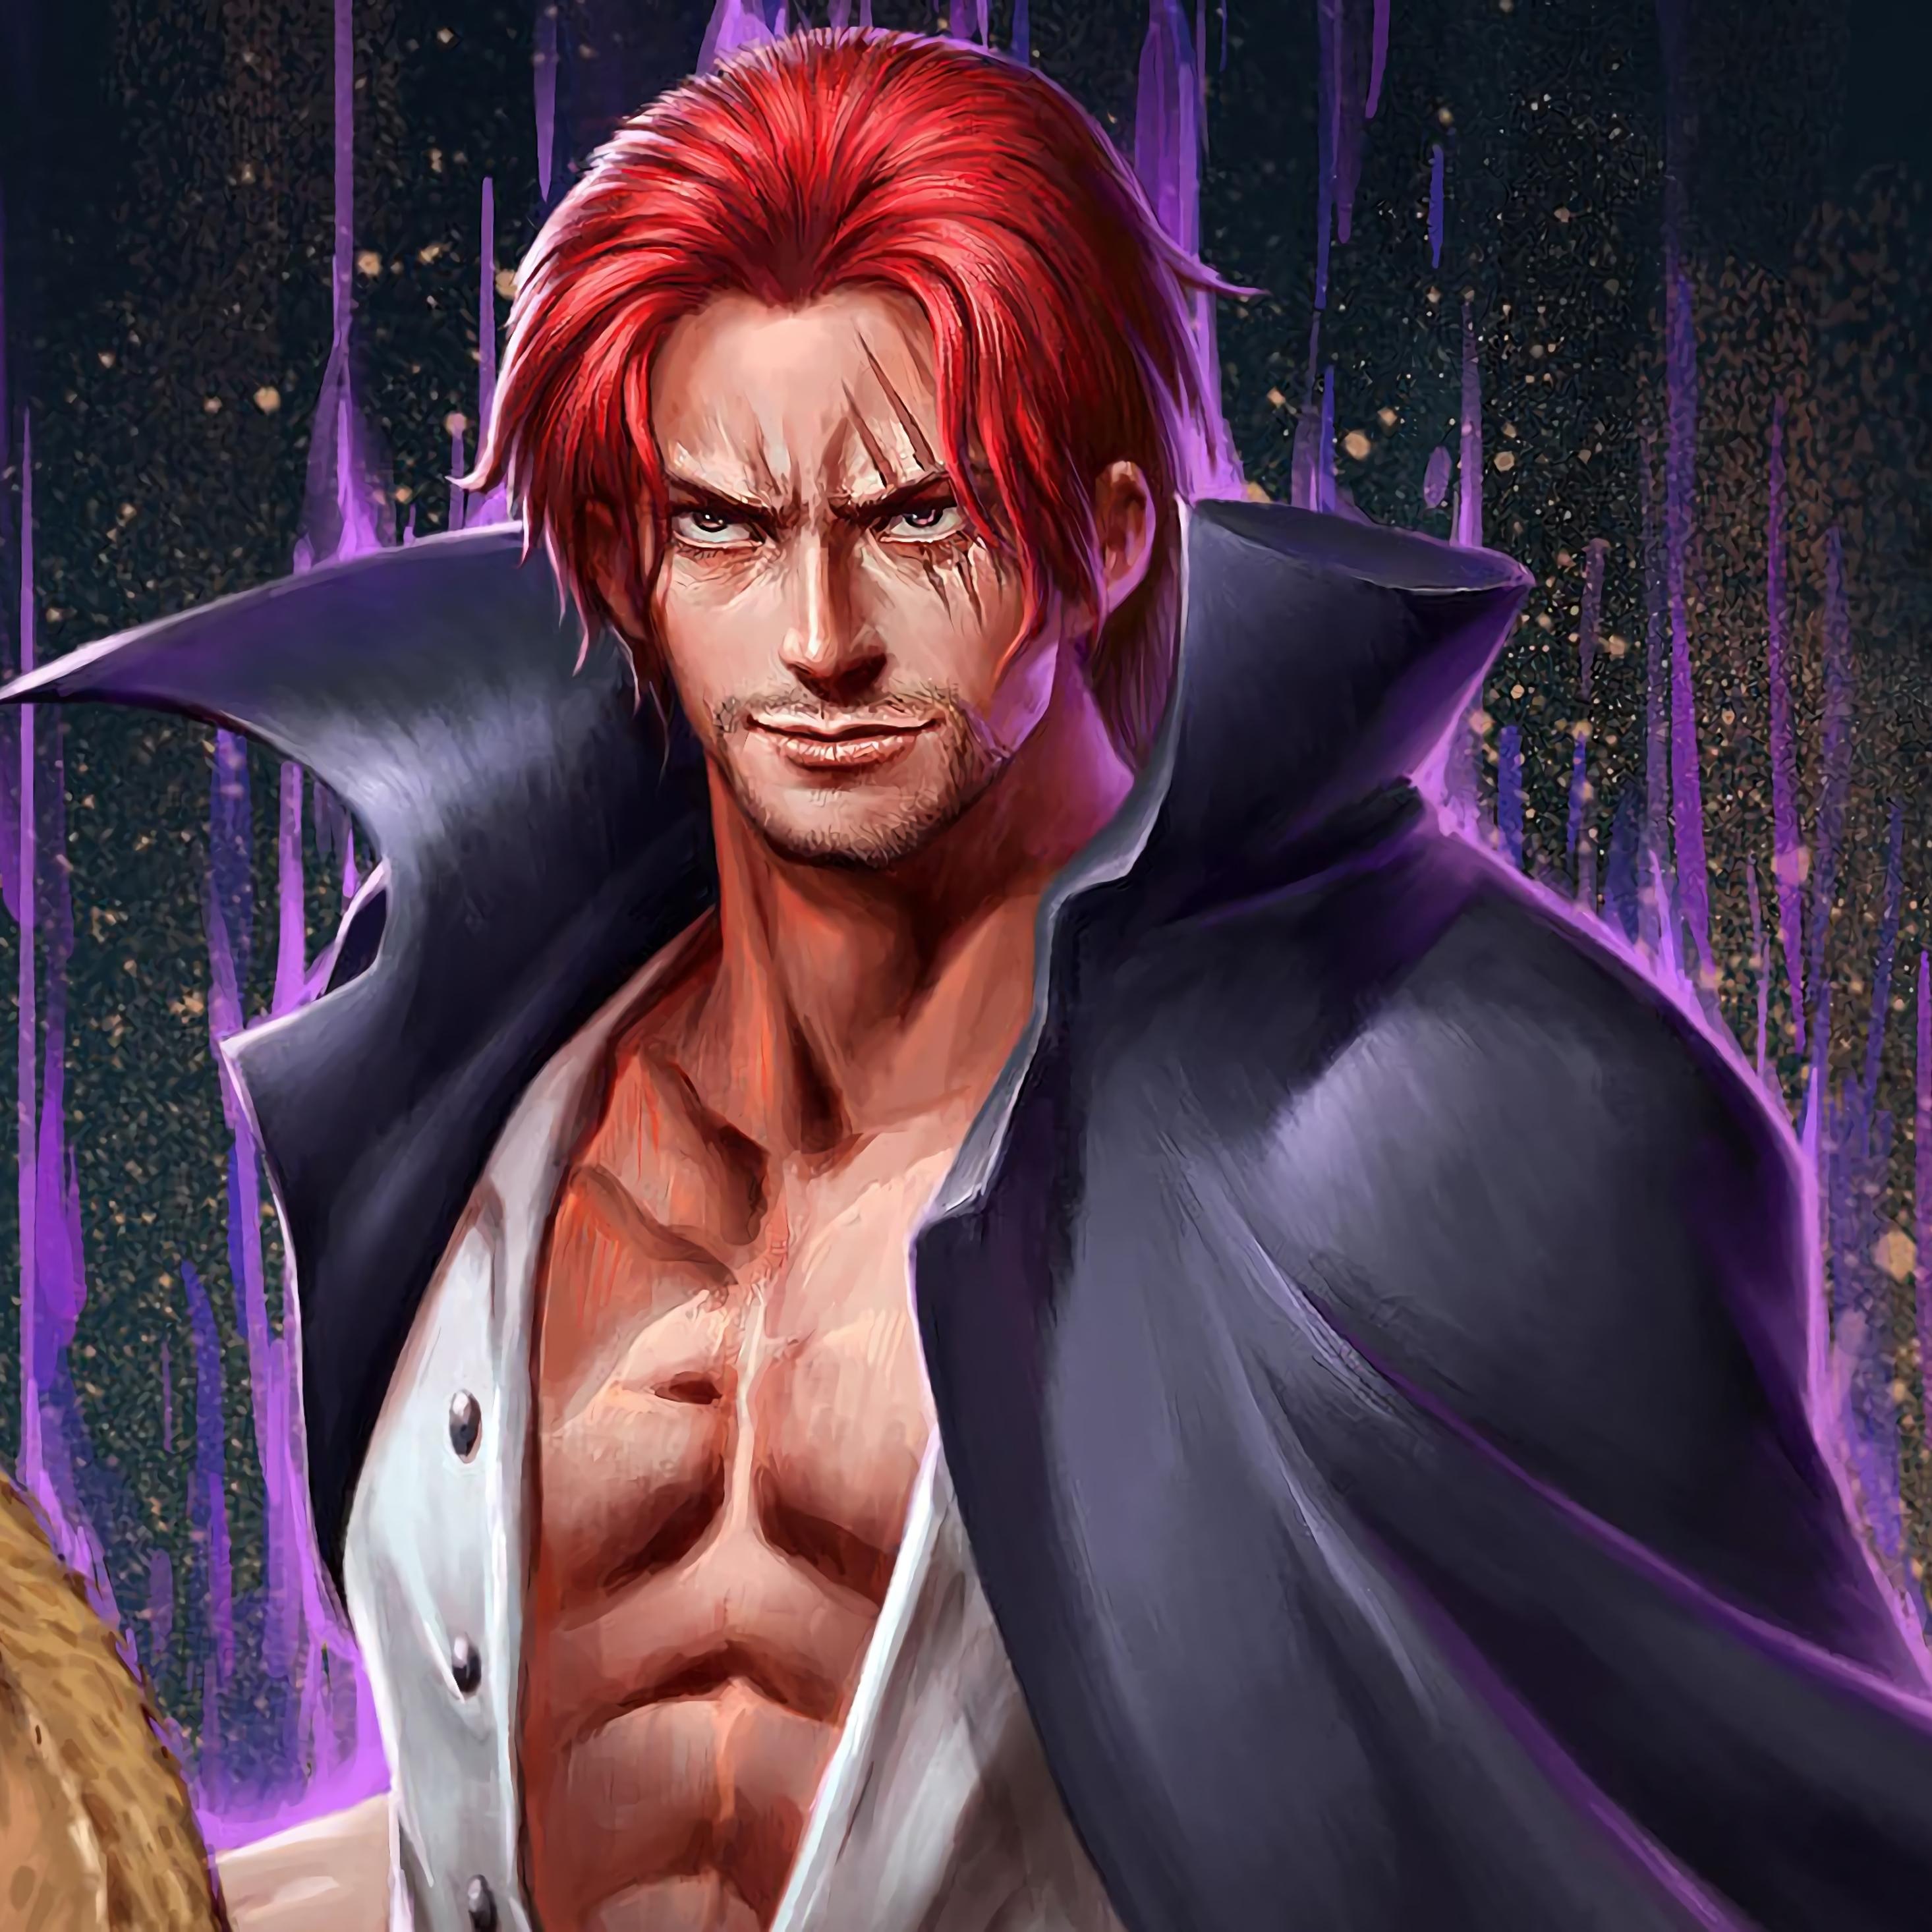 Download 950 Koleksi Wallpaper Android One Piece 3d HD Paling Keren